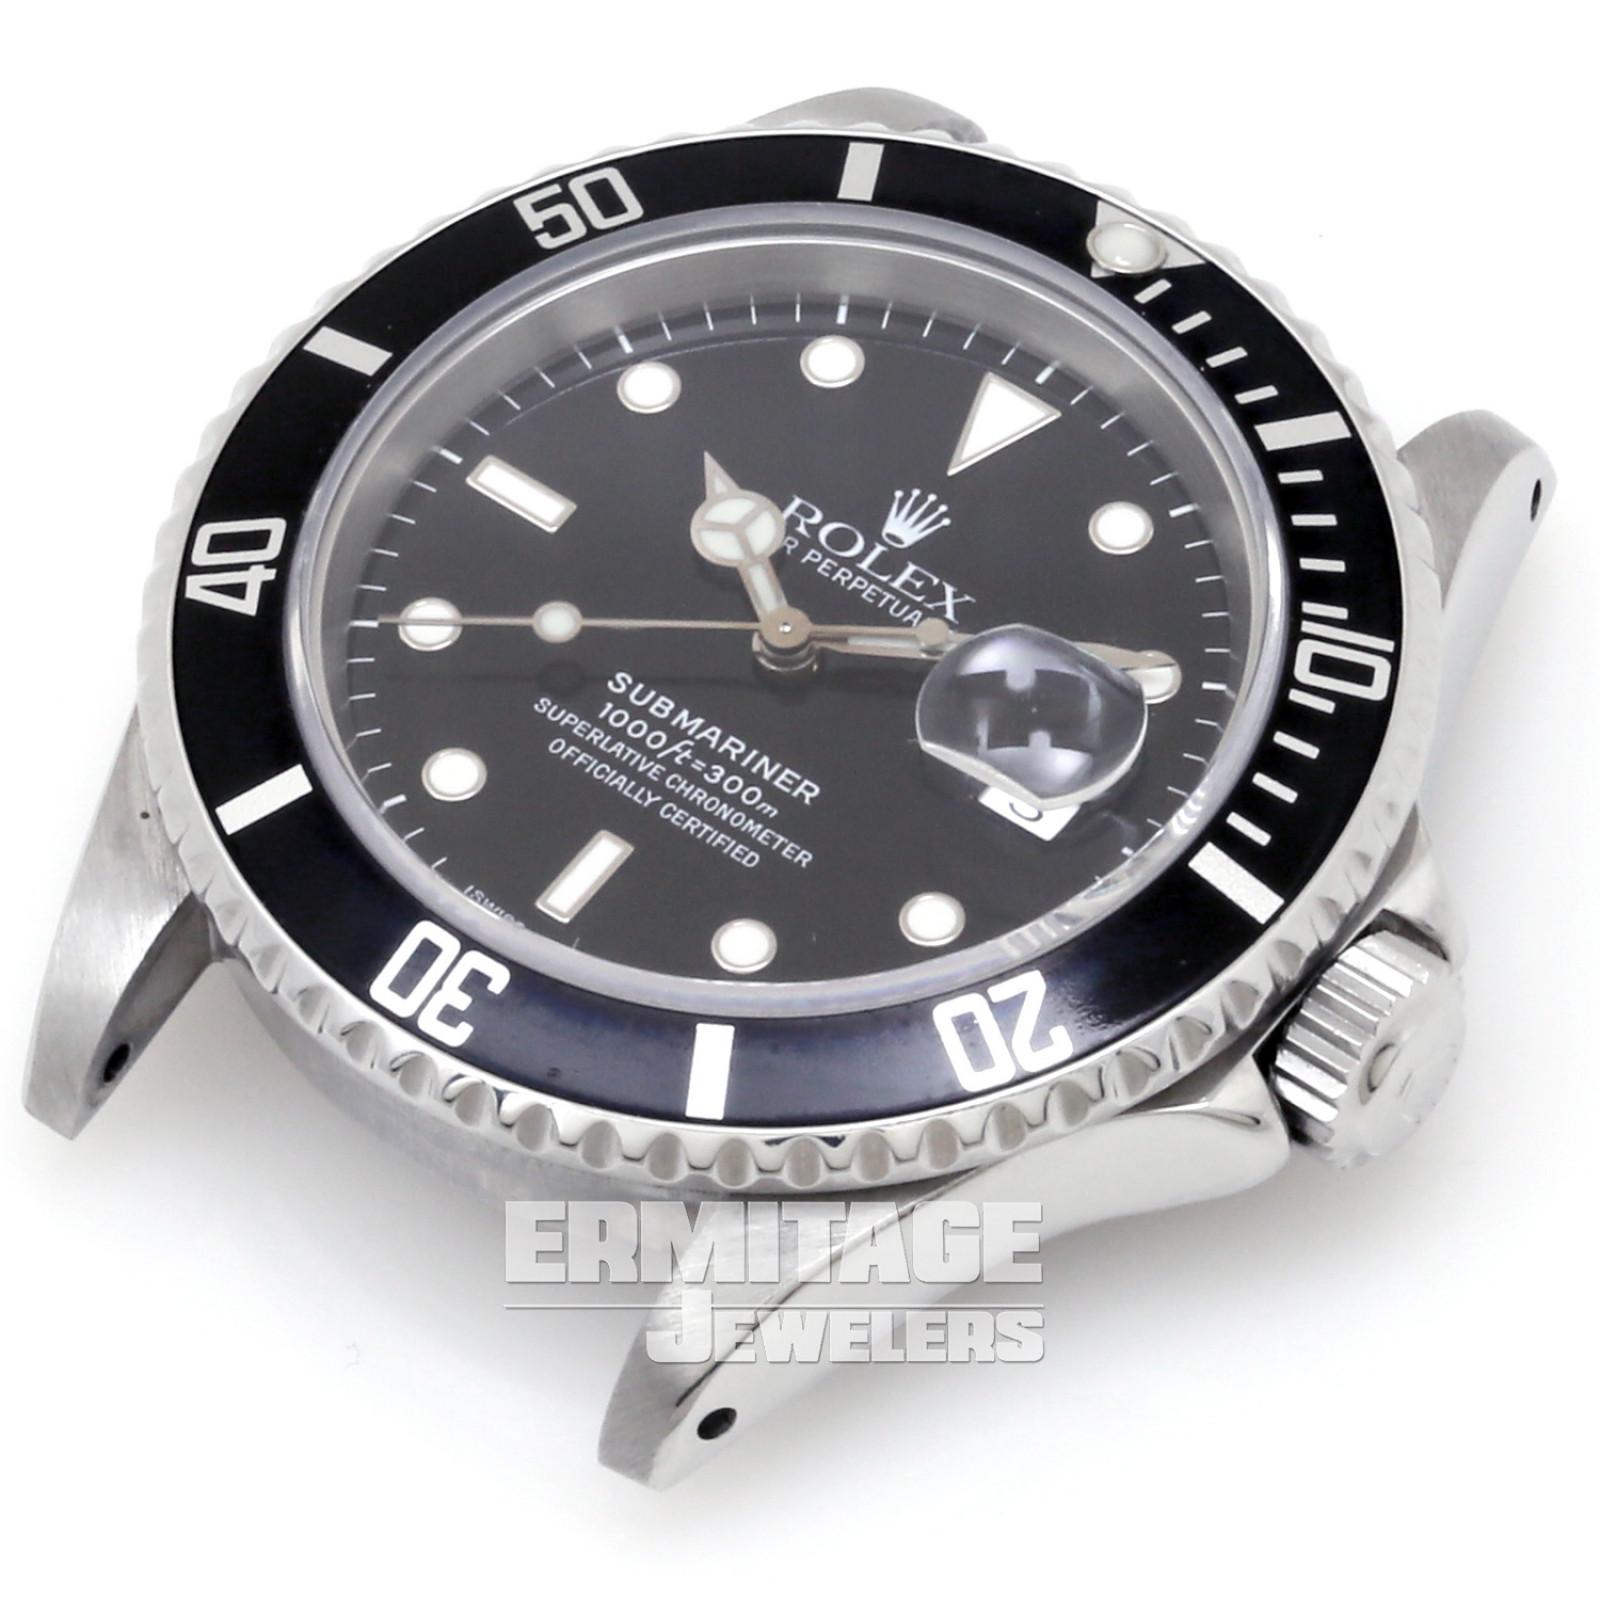 The Legendary Rolex Submariner 11610 Steel